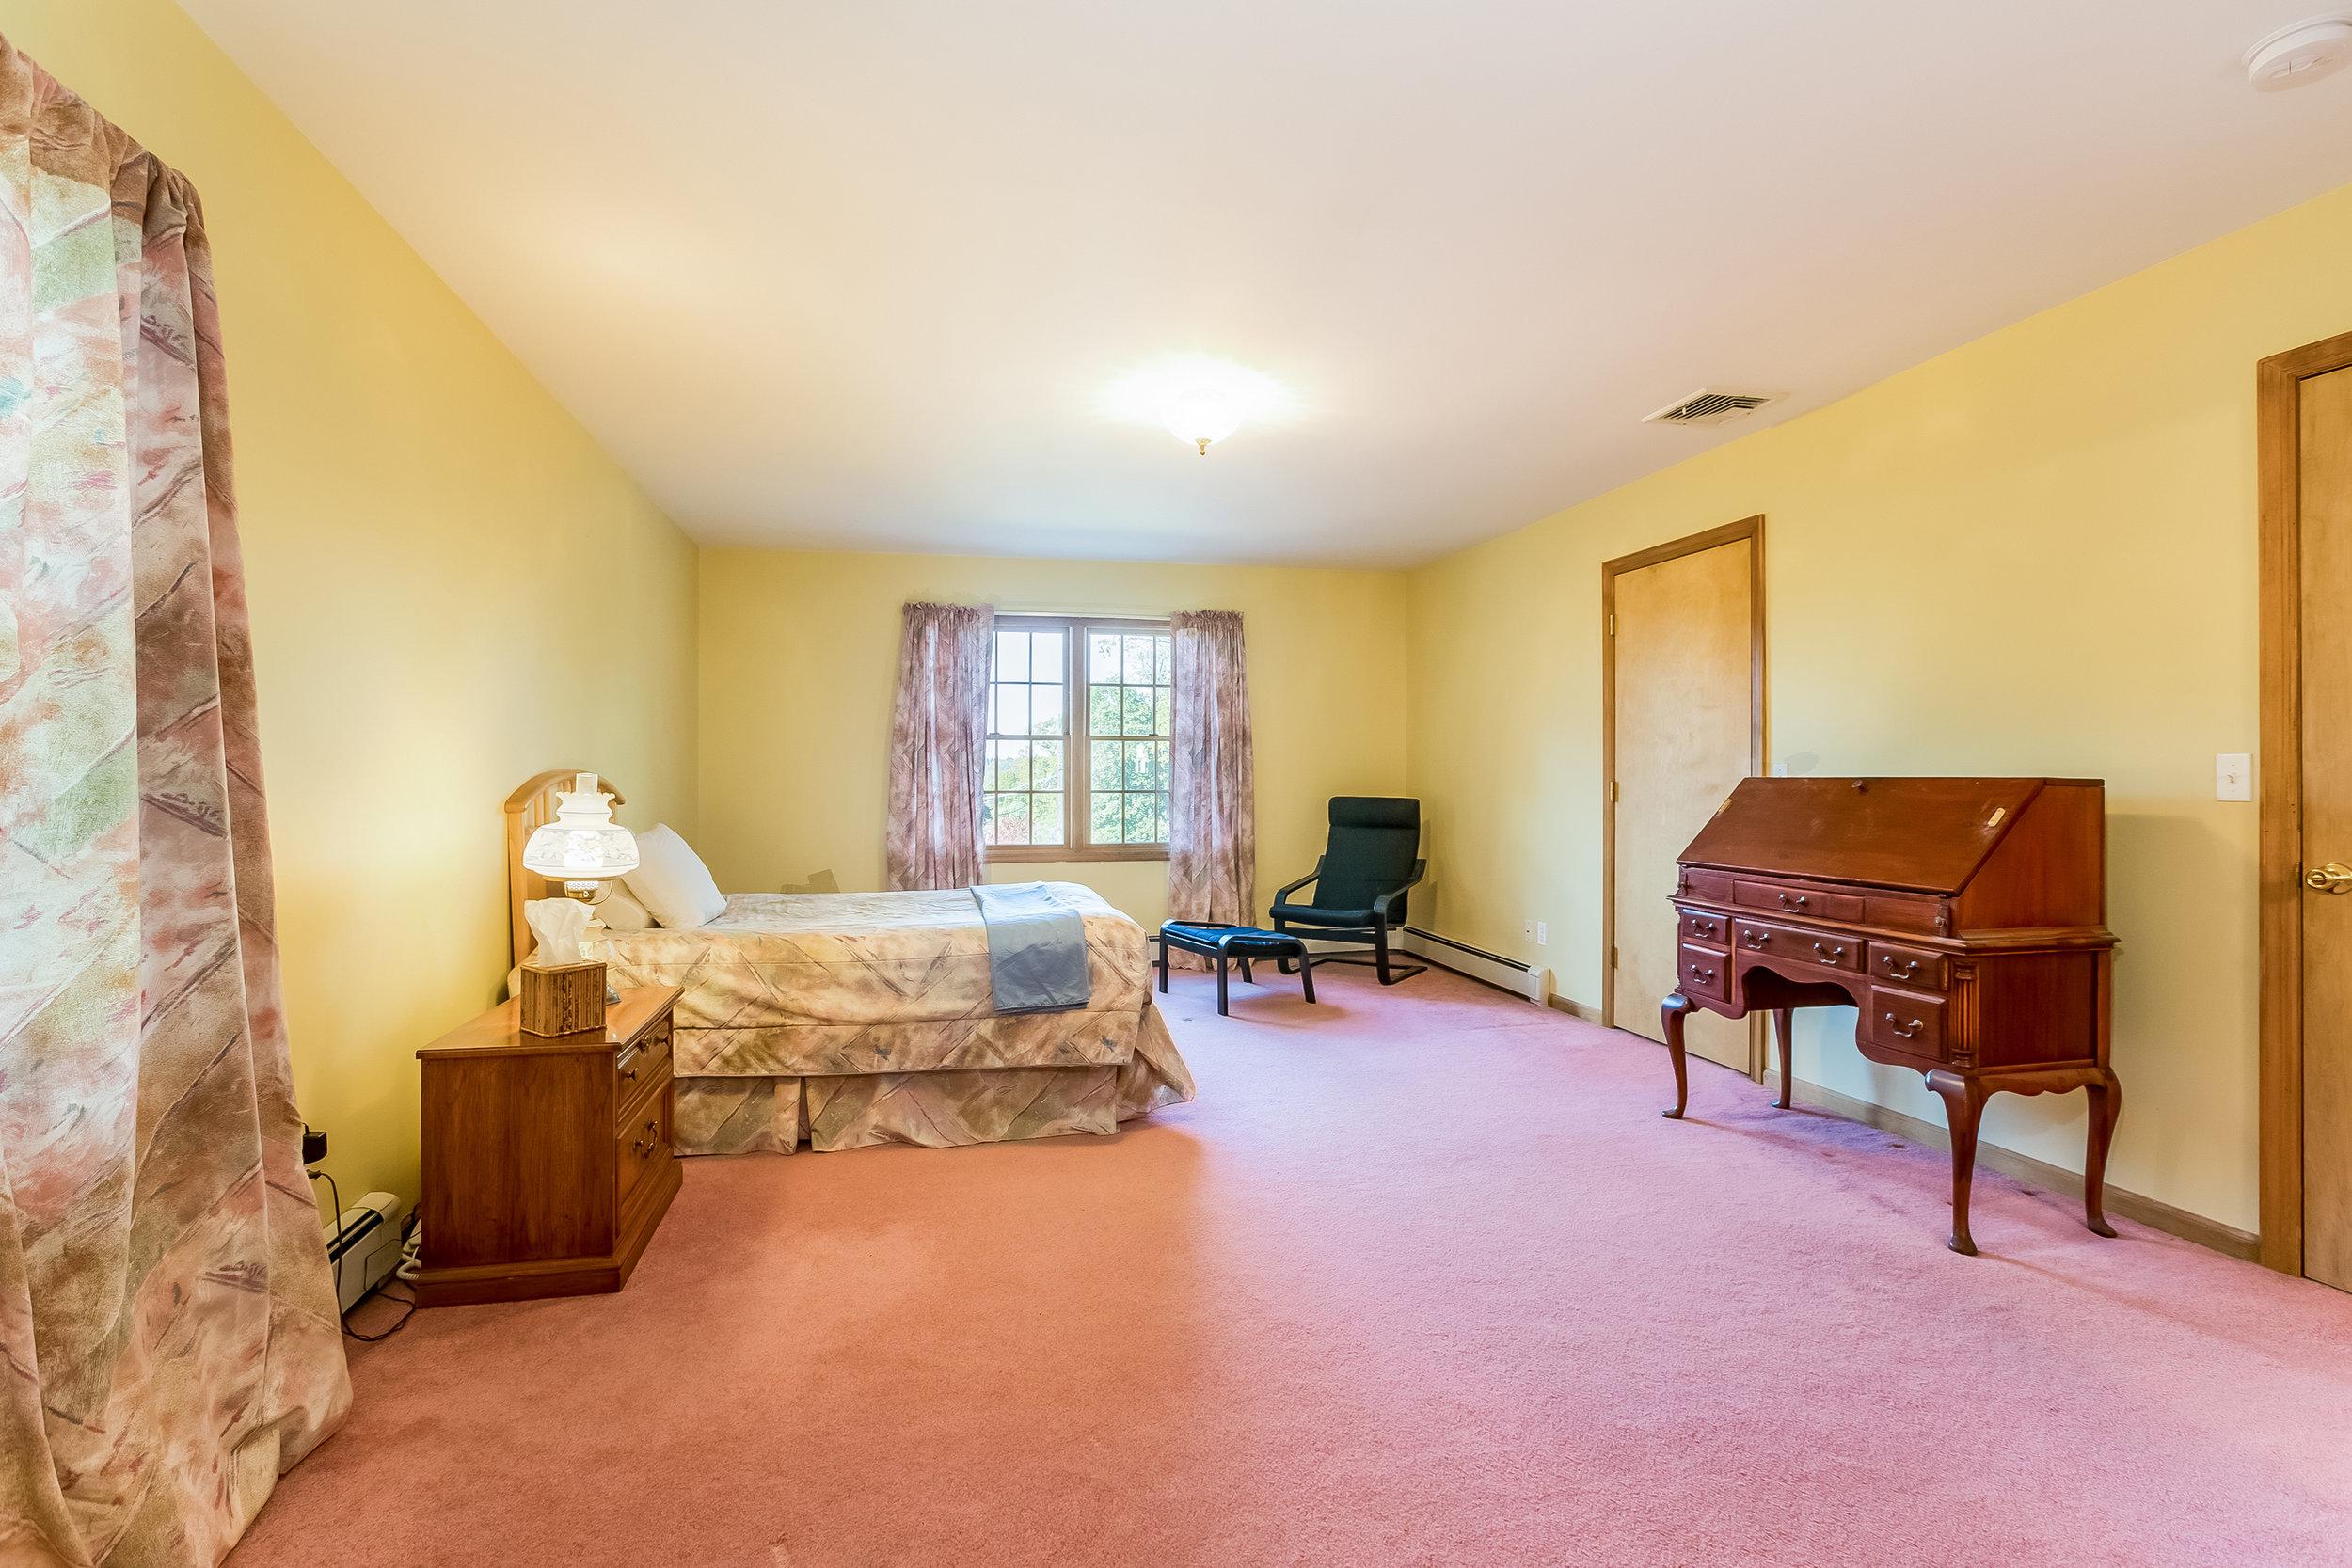 026-Master_Bedroom-5002163-large.jpg